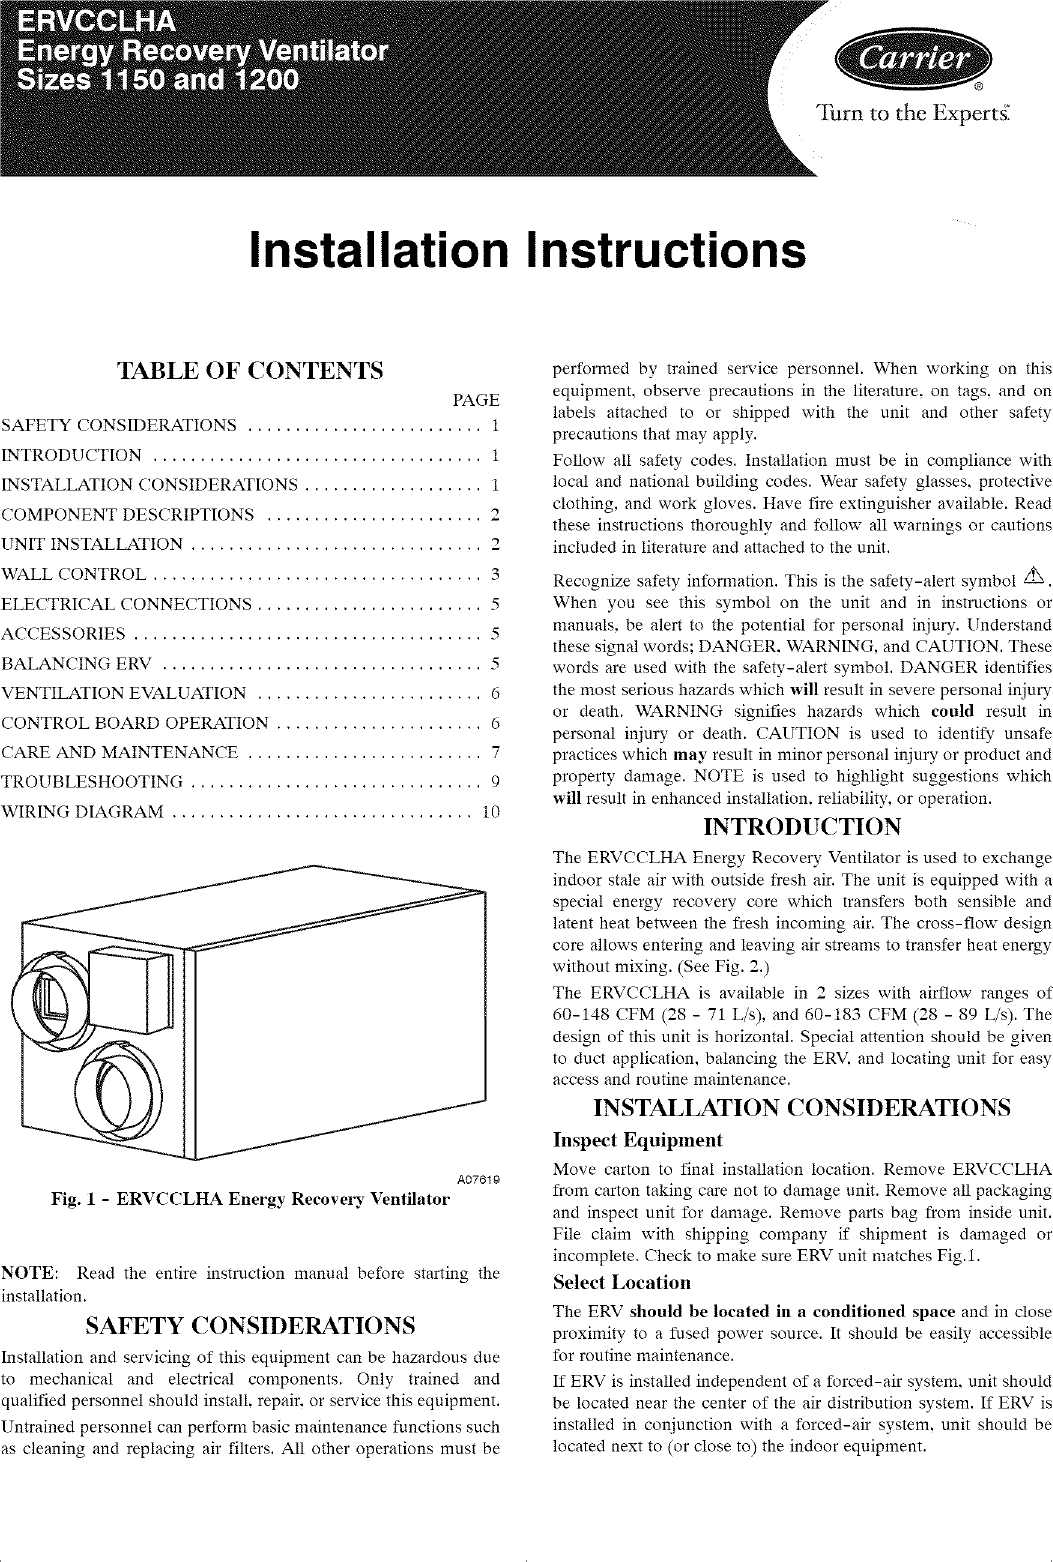 CARRIER Ventilator Manual L0712310